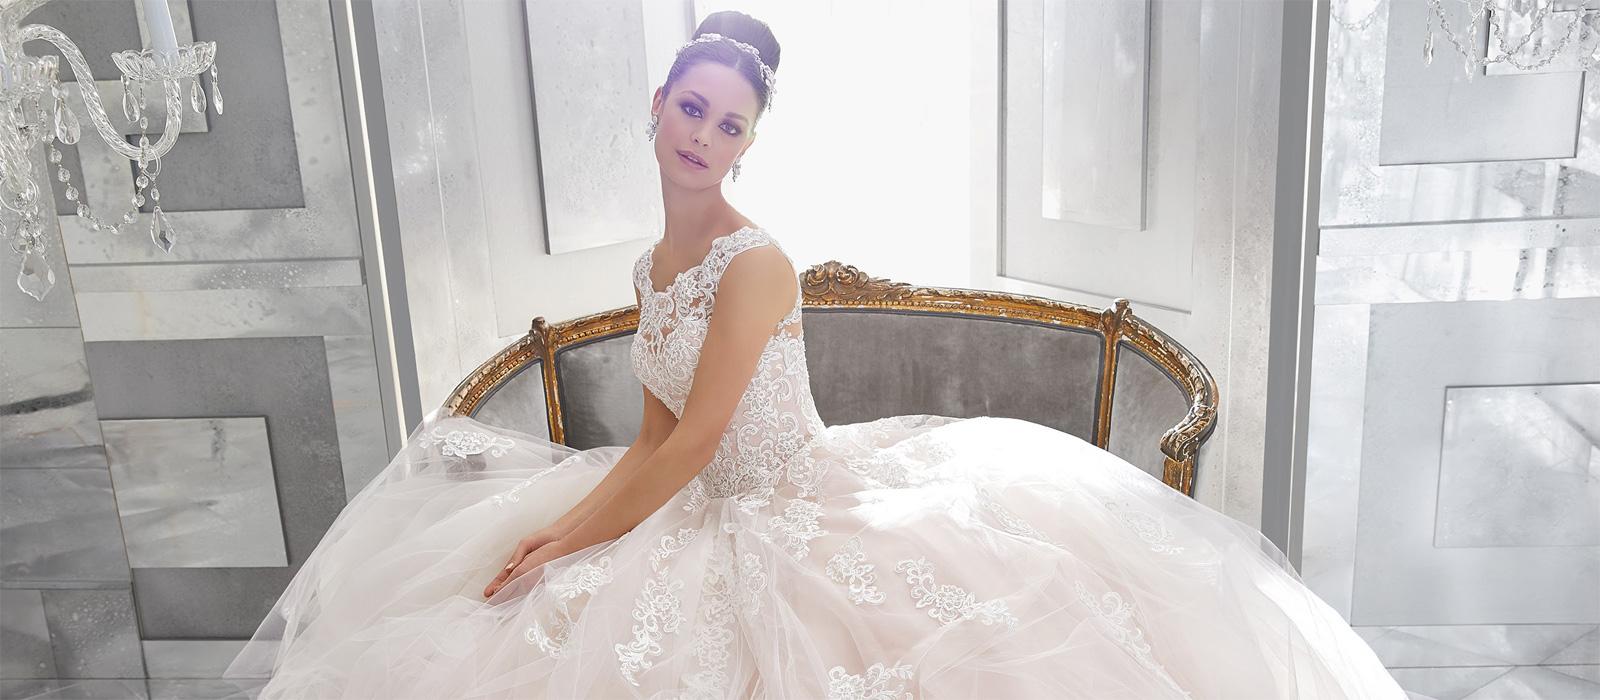 Bridal Shop & Wedding Dresses Irvine Ayrshire Scotland | Dream Brides